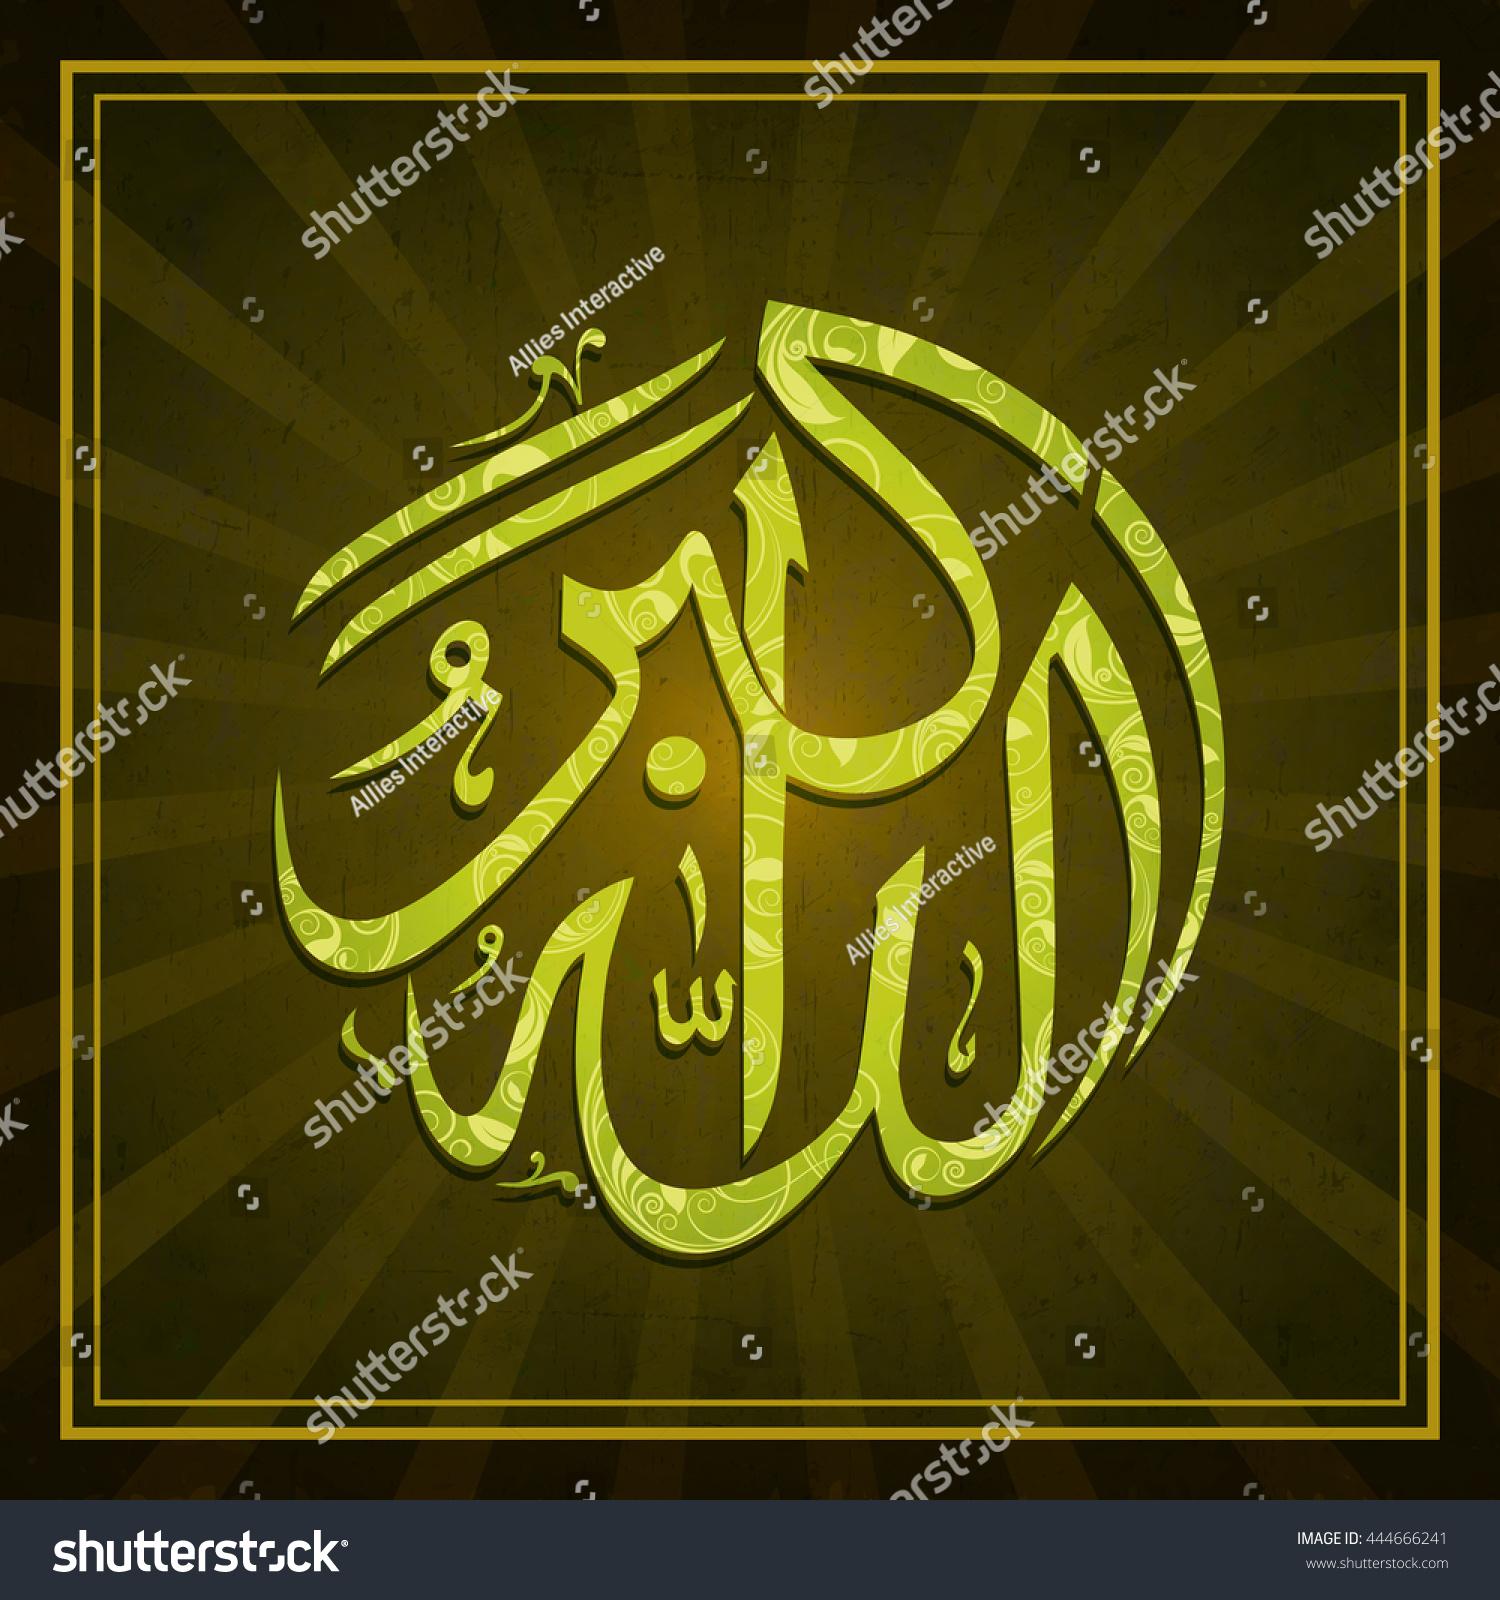 Allah Akbar Musique arabic islamic calligraphy dua wish allahu stock vector (royalty